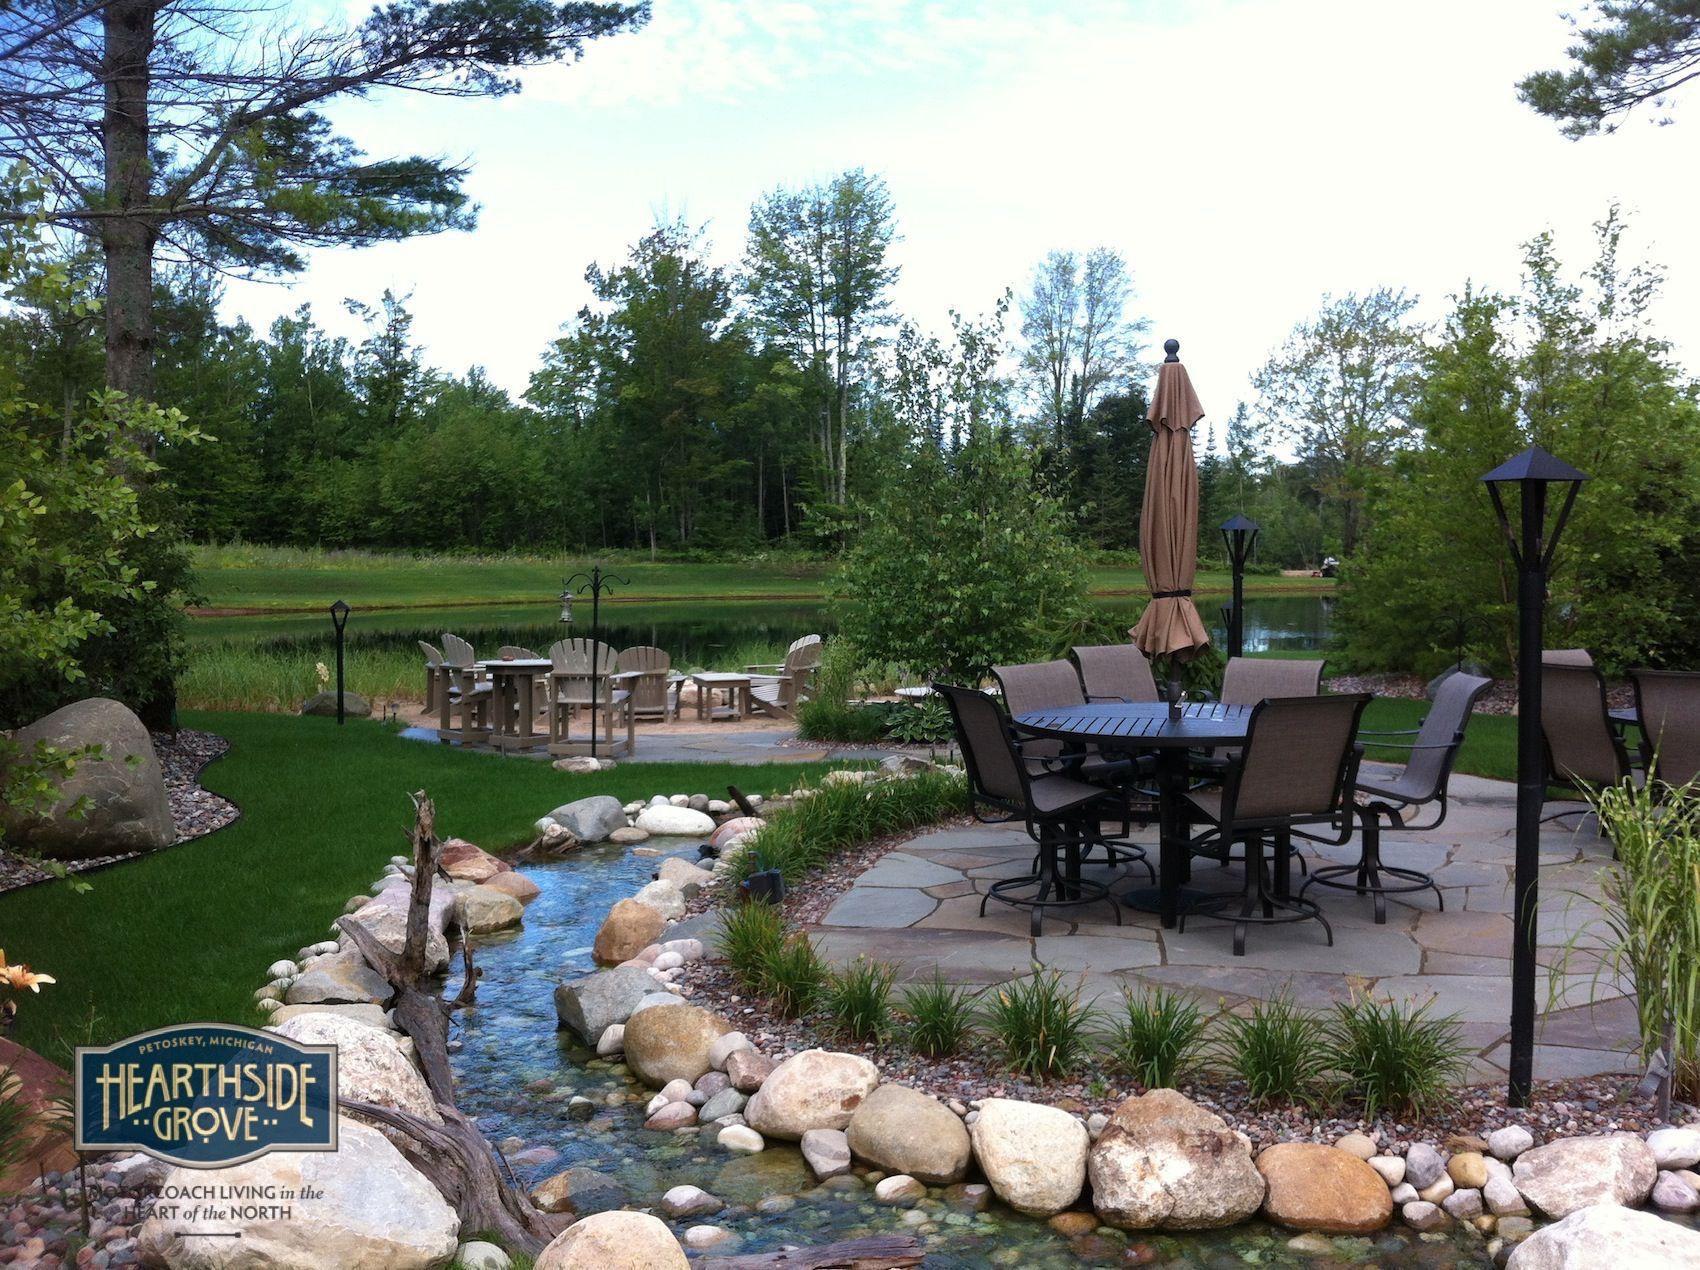 Hearthside Grove Luxury Motorcoach Resort Lot 135   #exterior #patio #stone  #creek